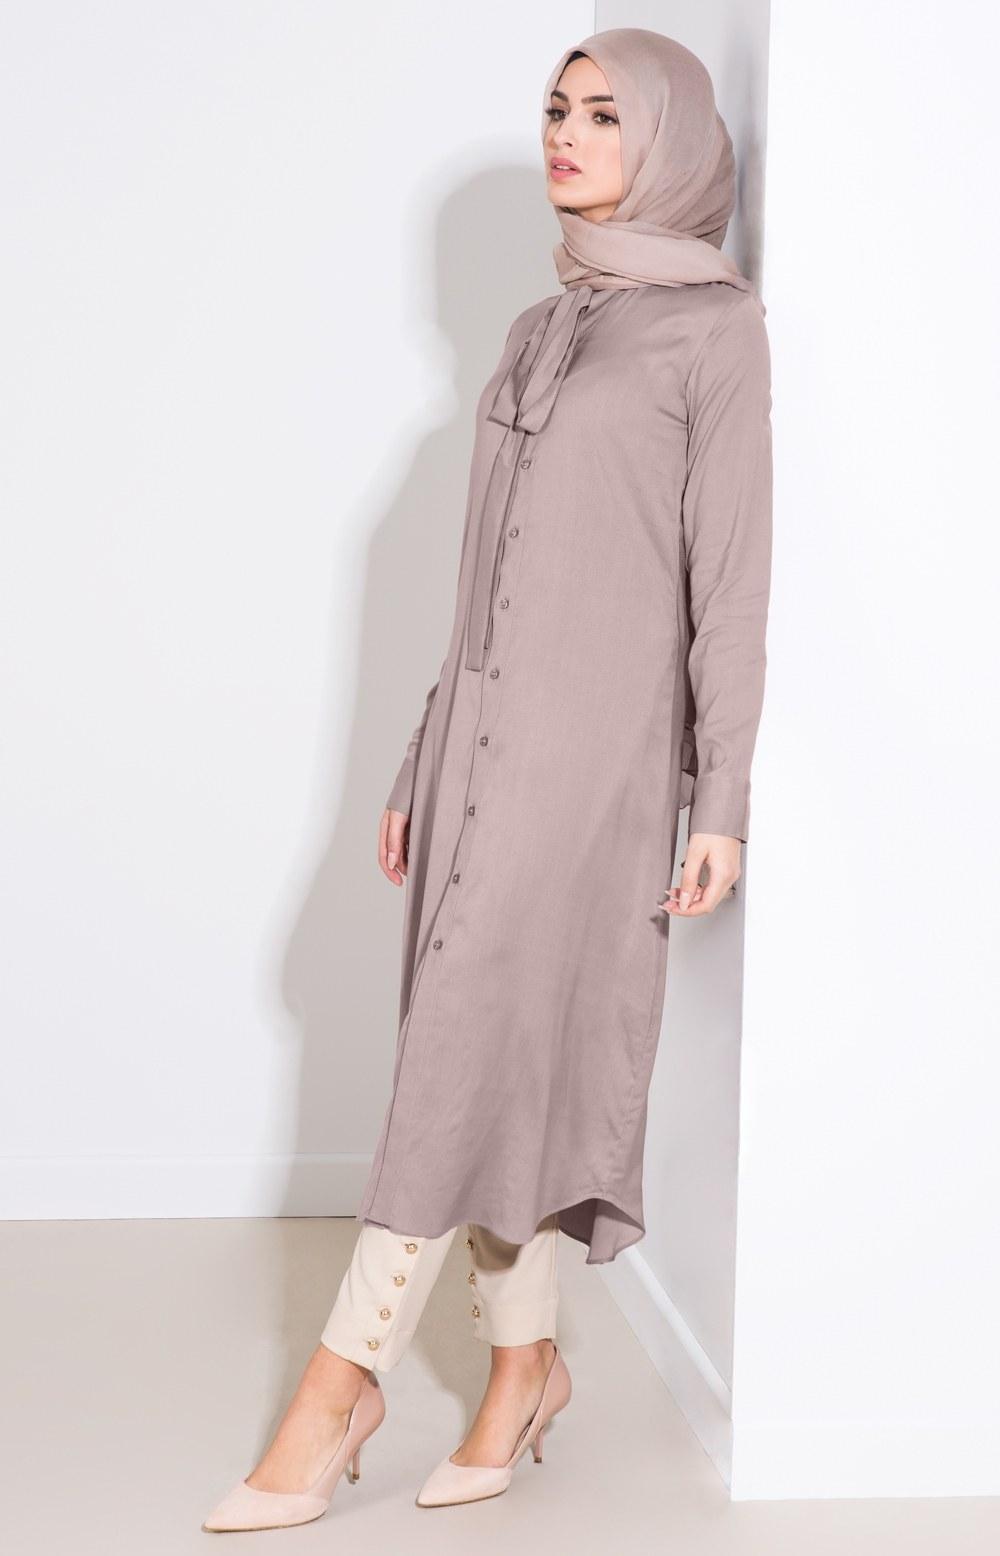 Model Model Baju Lebaran 2018 Wanita Tldn 25 Trend Model Baju Muslim Lebaran 2018 Simple & Modis